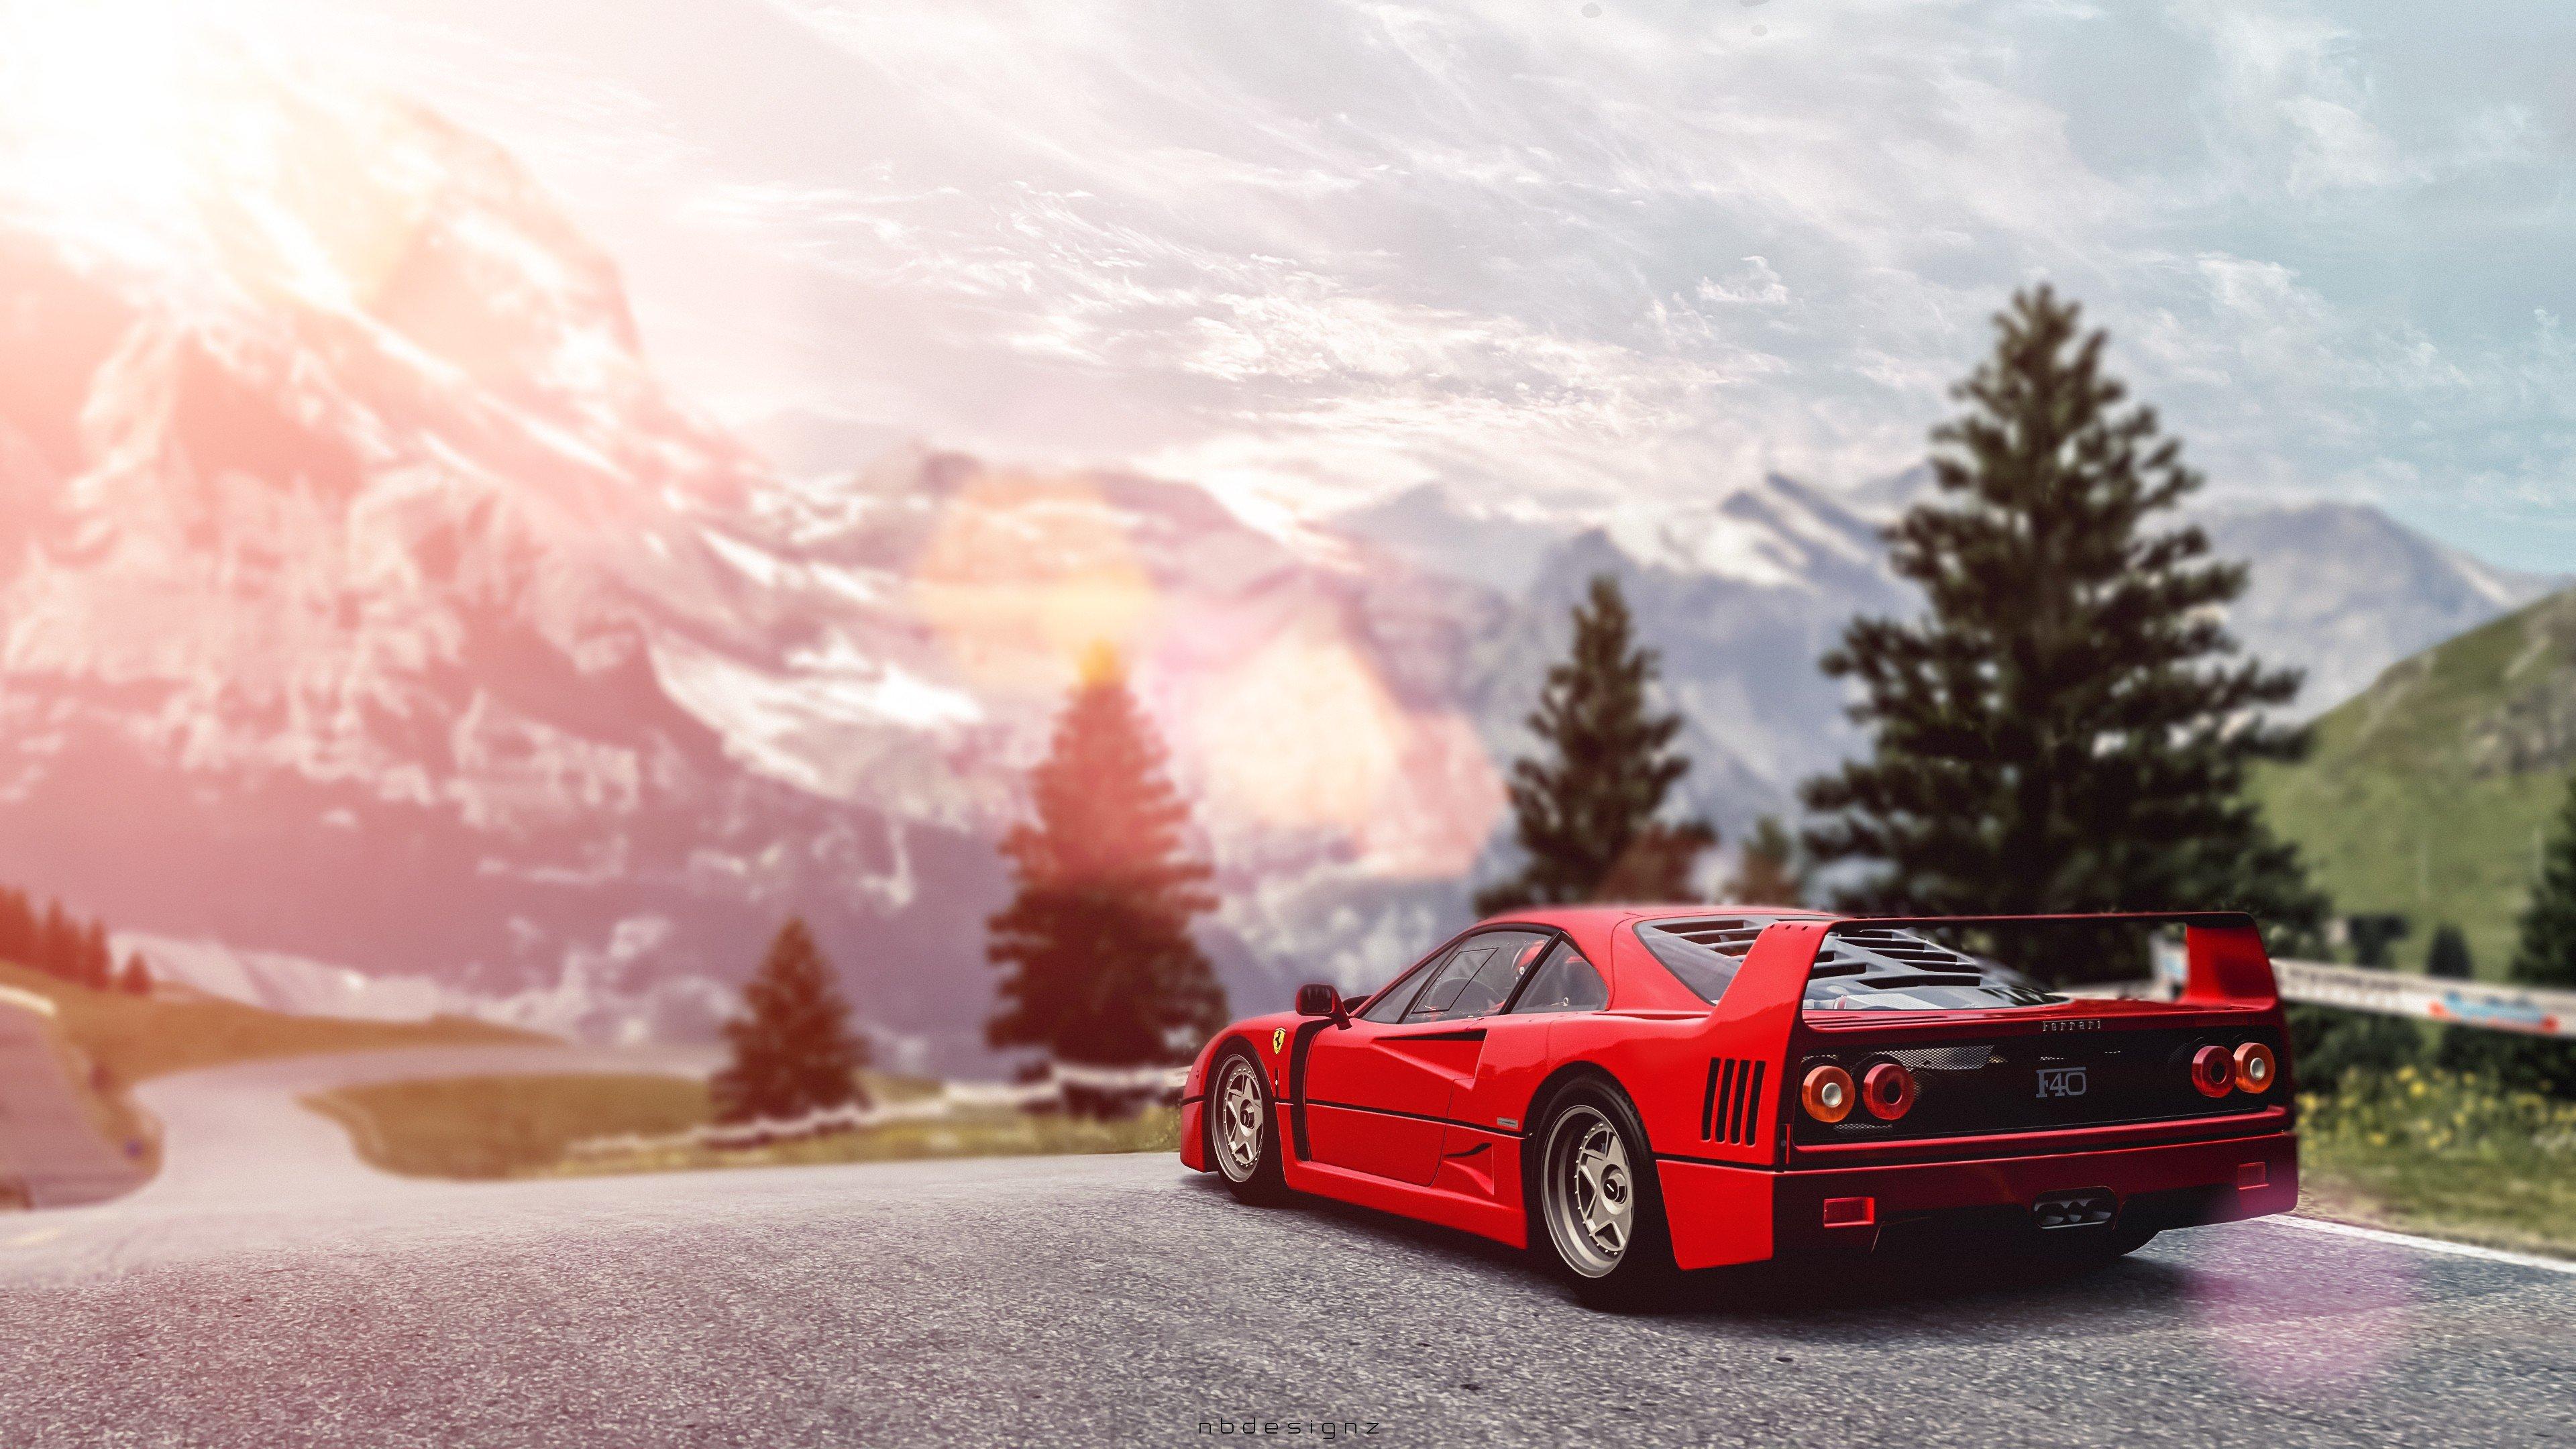 Gran Turismo 6 Gran Turismo Ferrari Ferrari F40 Video Games Hd Wallpapers Desktop And Mobile Images Photos